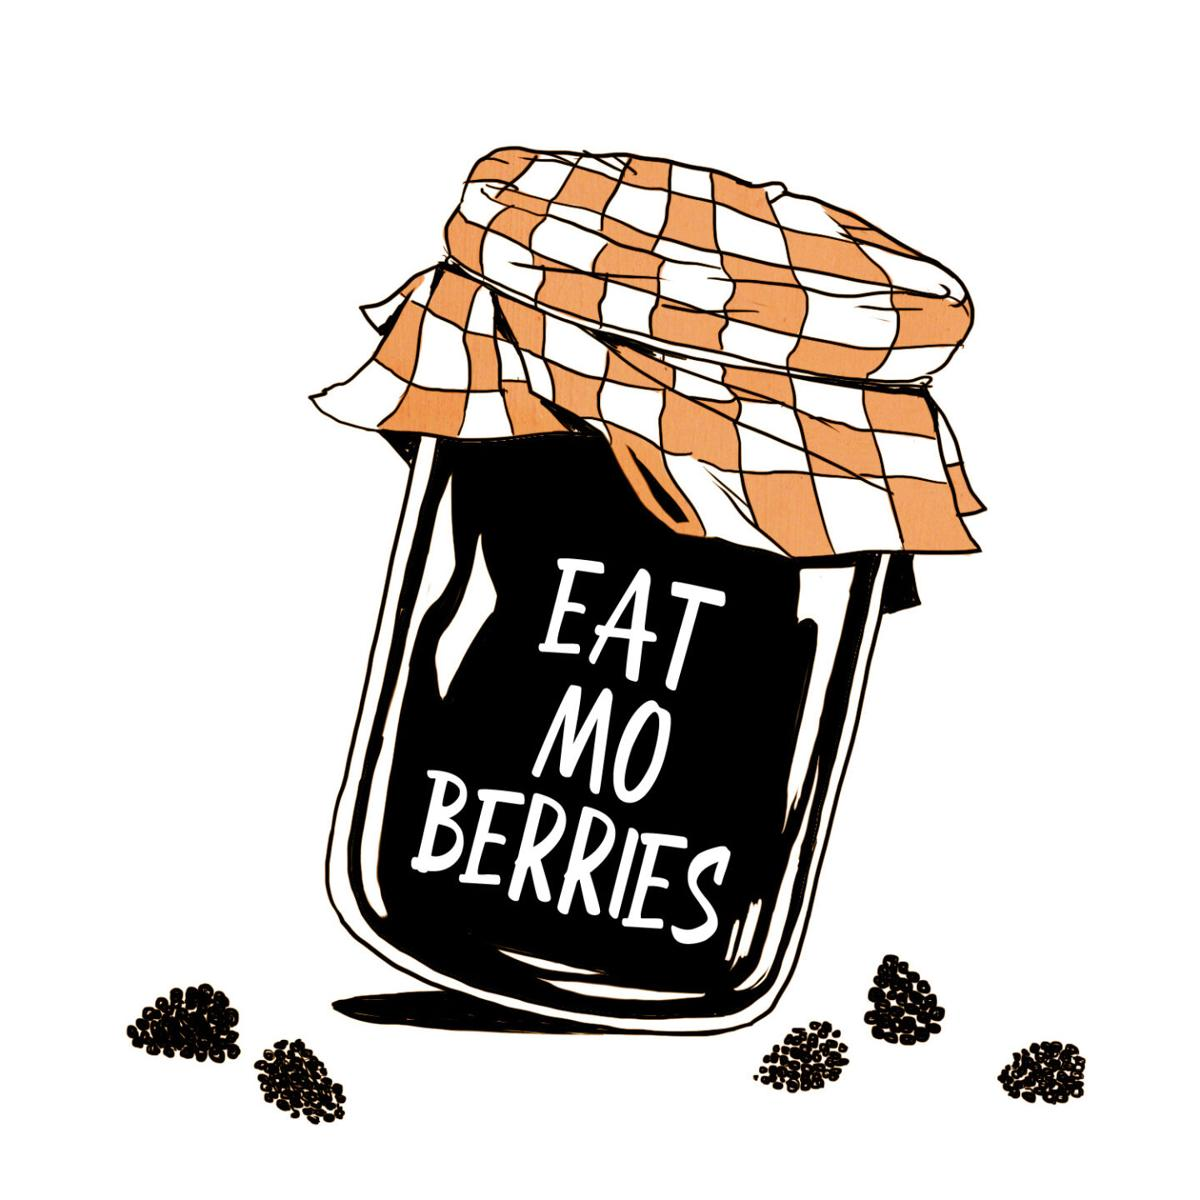 Hidden in the Hollers eat mo berries